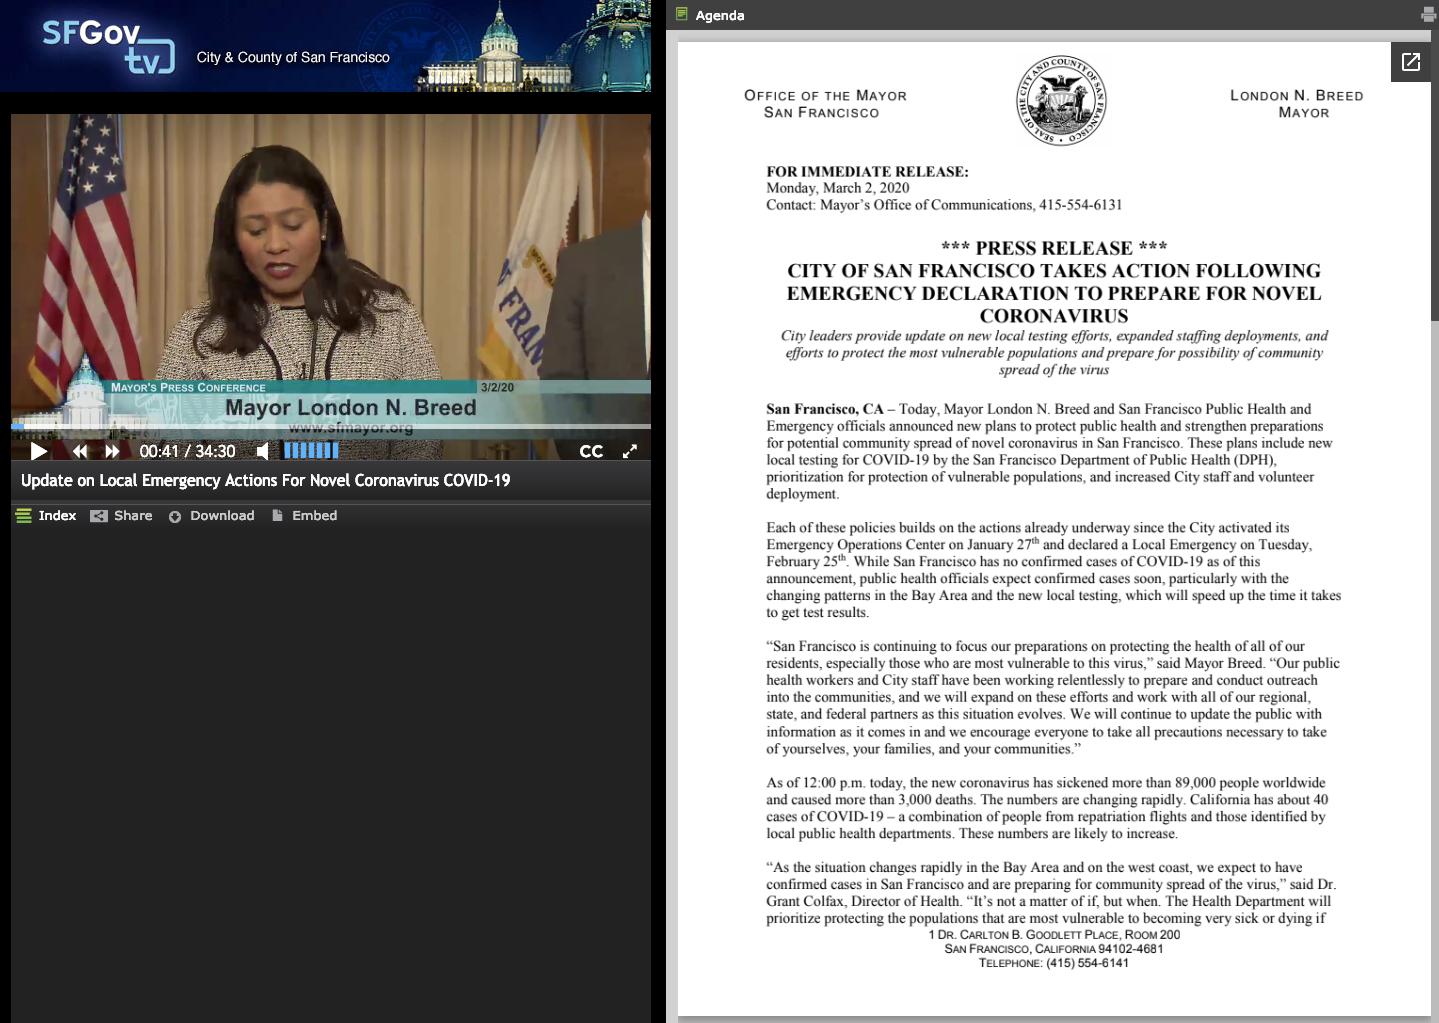 screenshot of San Fracisco mayor speaking about COVID:19